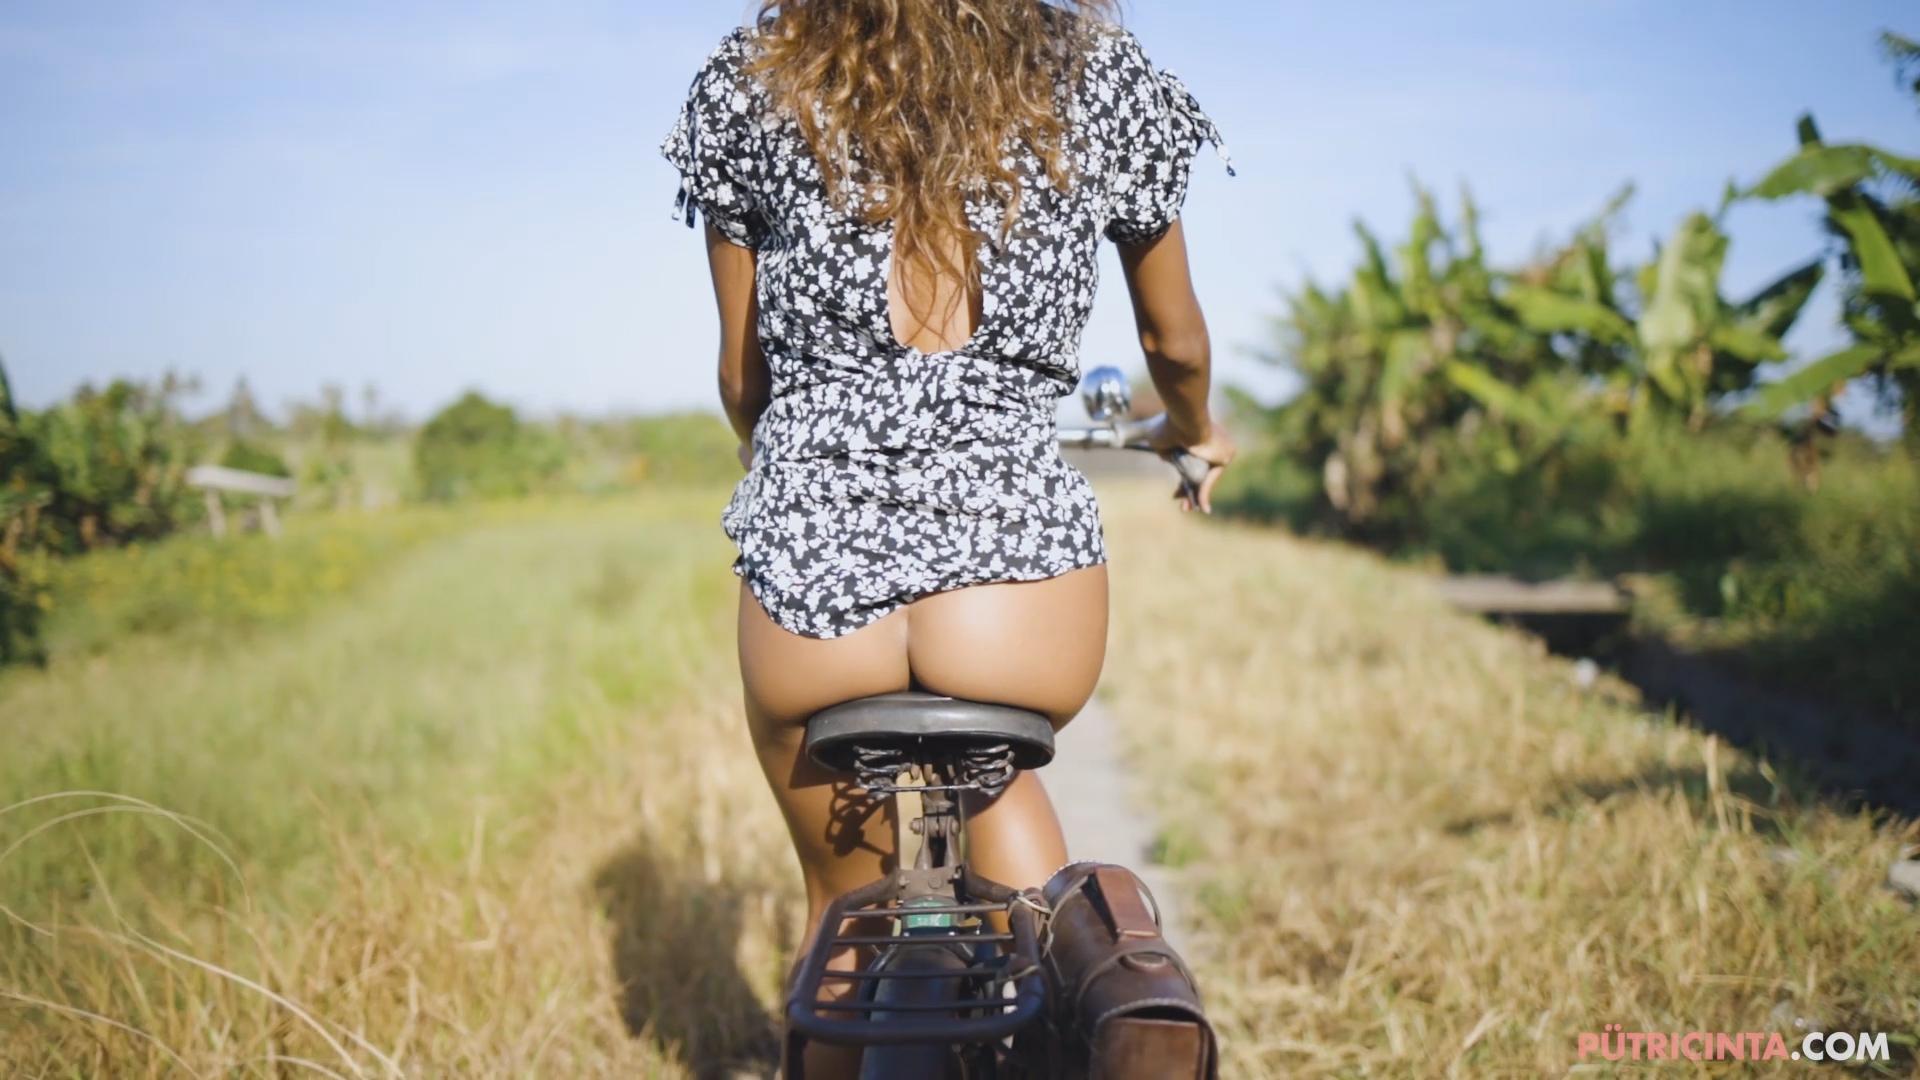 024-cyclingcommando-Putri-Cinta-teaser-stills-8.jpg